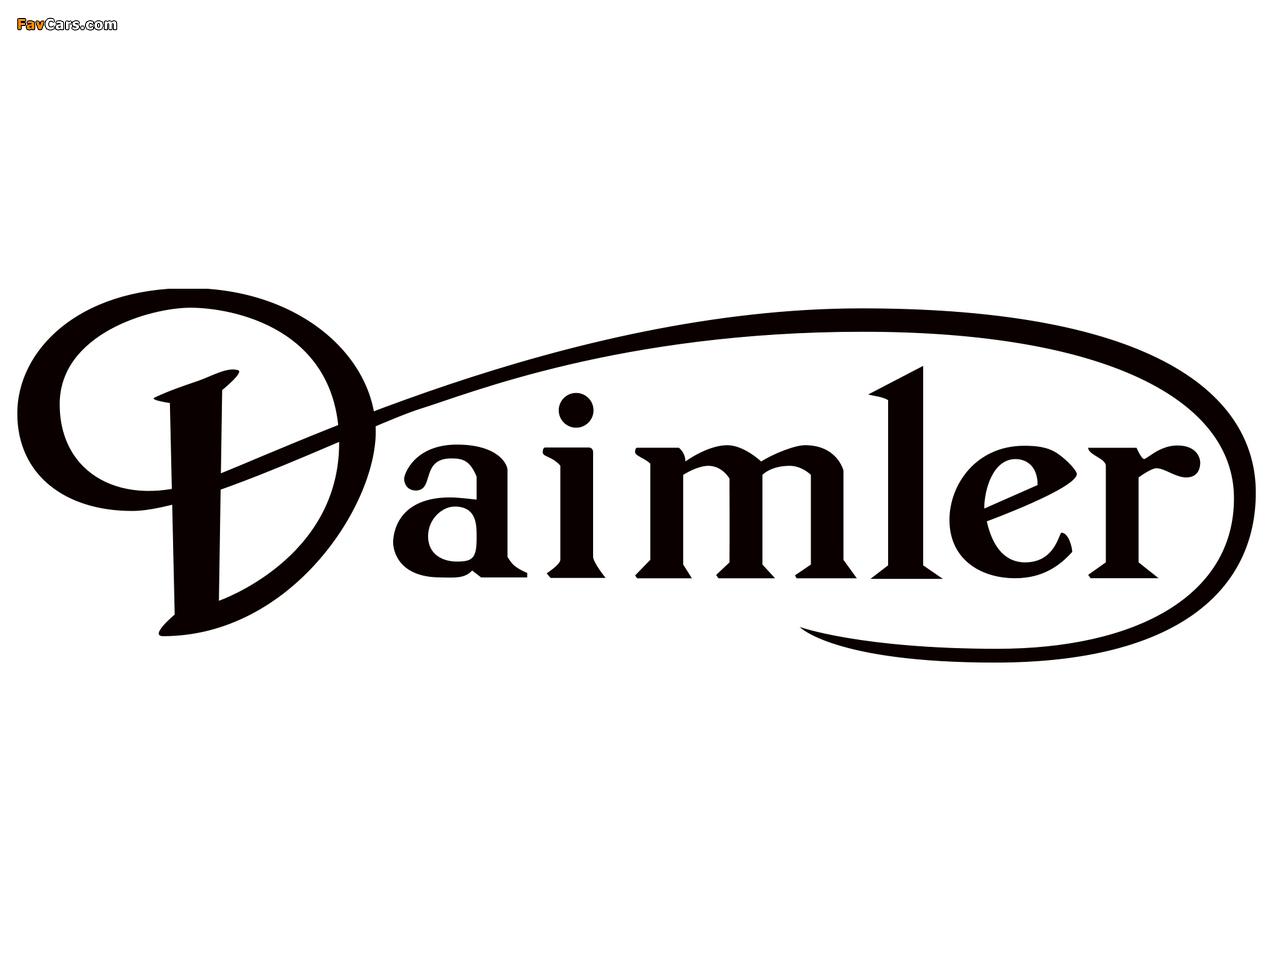 Daimler wallpapers (1280 x 960)